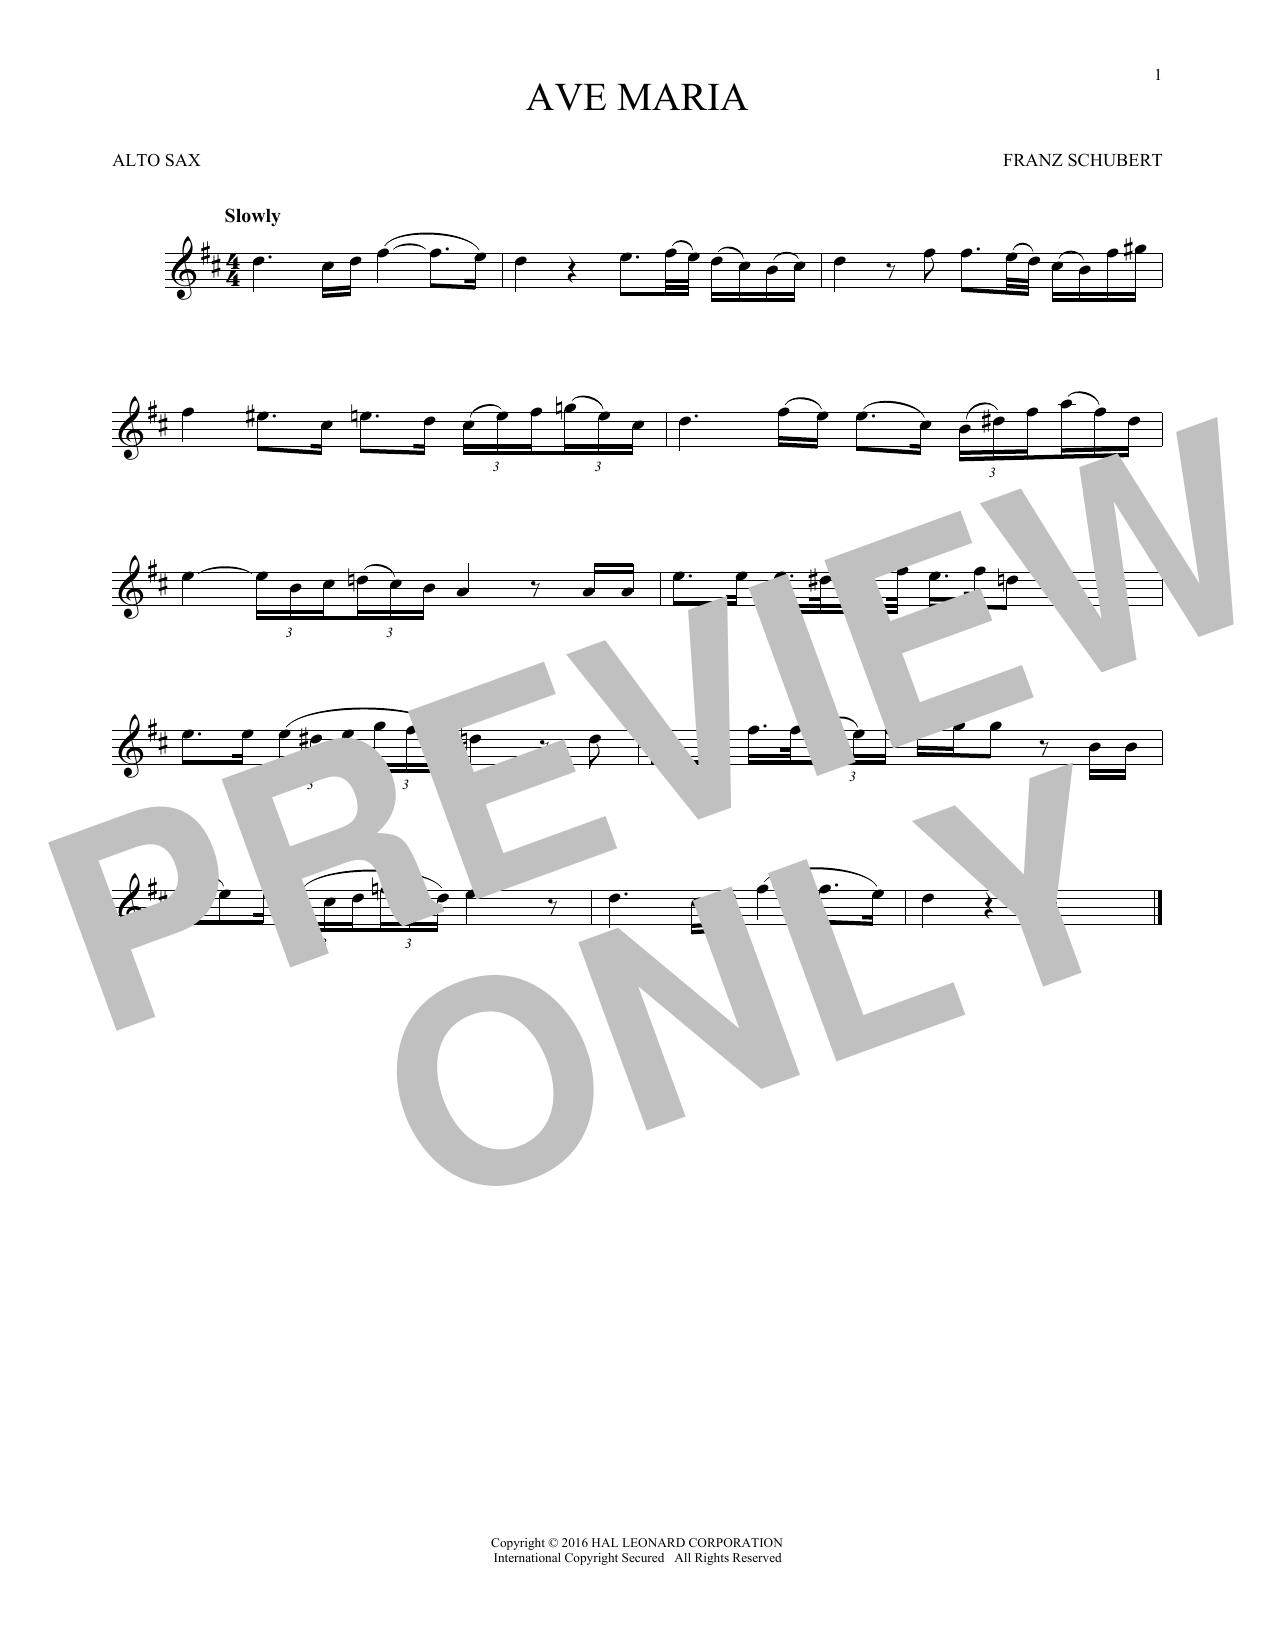 Ave Maria, Op. 52, No. 6 (Alto Sax Solo)